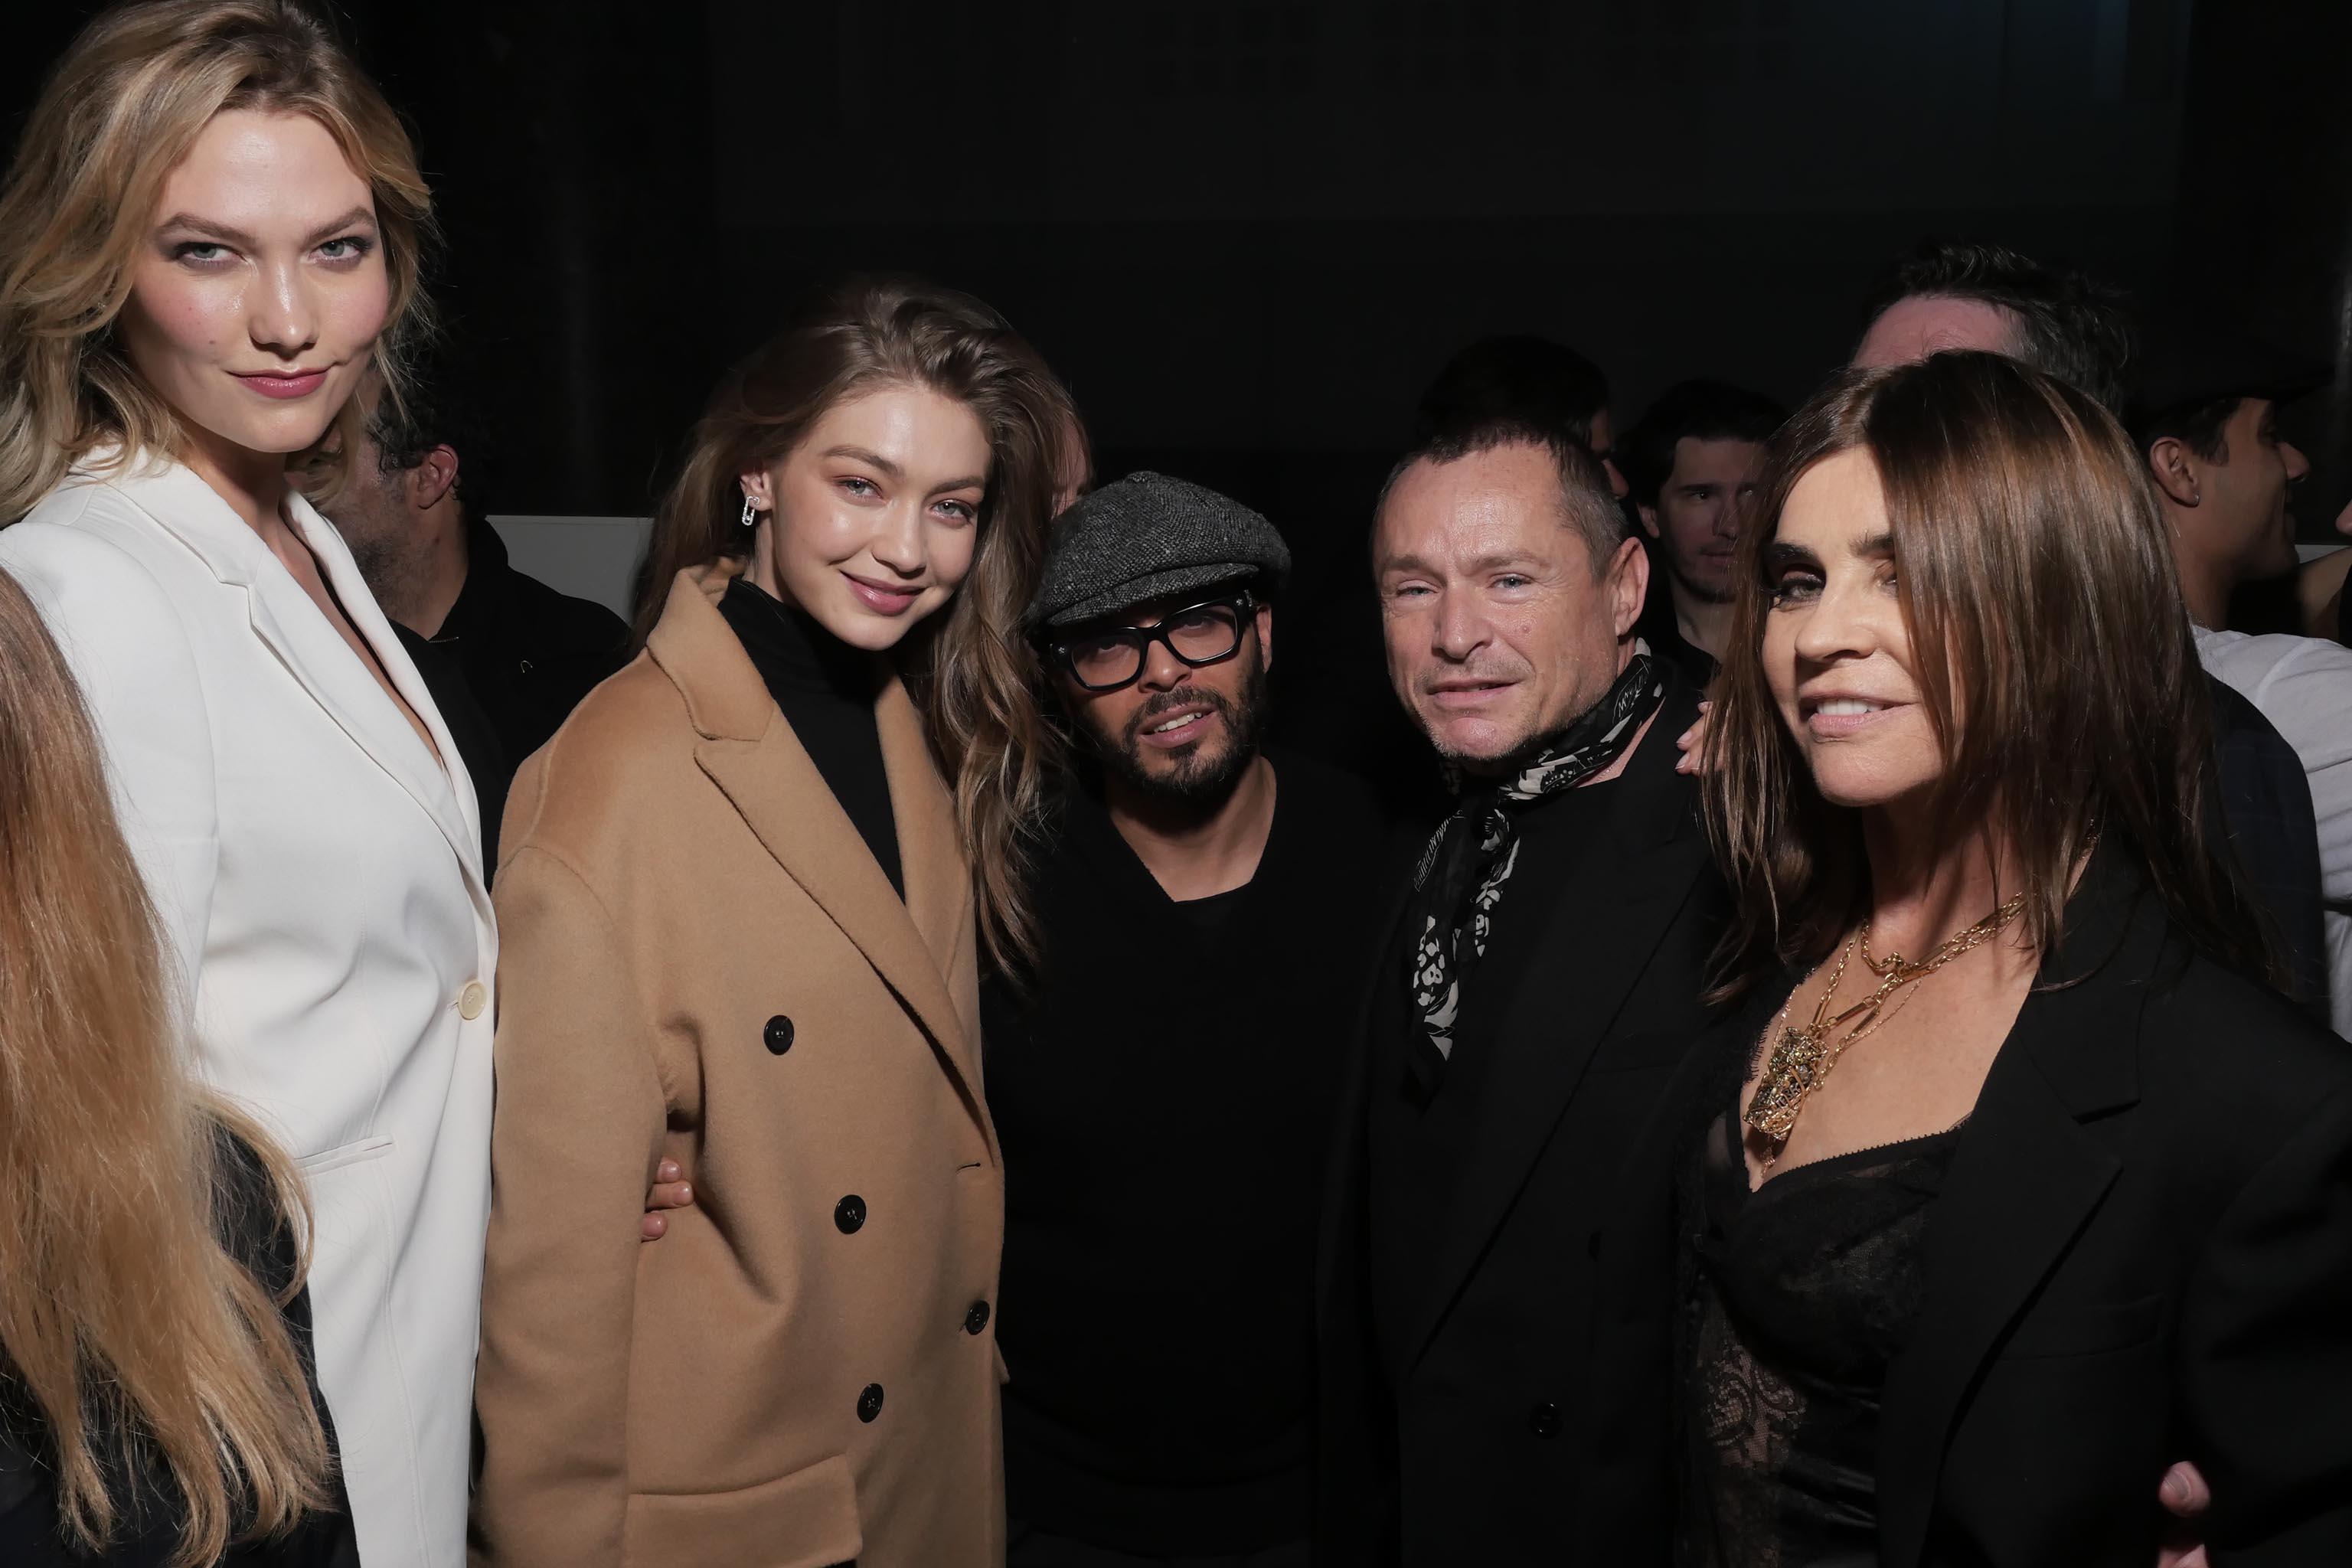 Karlie Kloss, Gigi Hadid, Tom Pecheux, and Carine Roitfeld